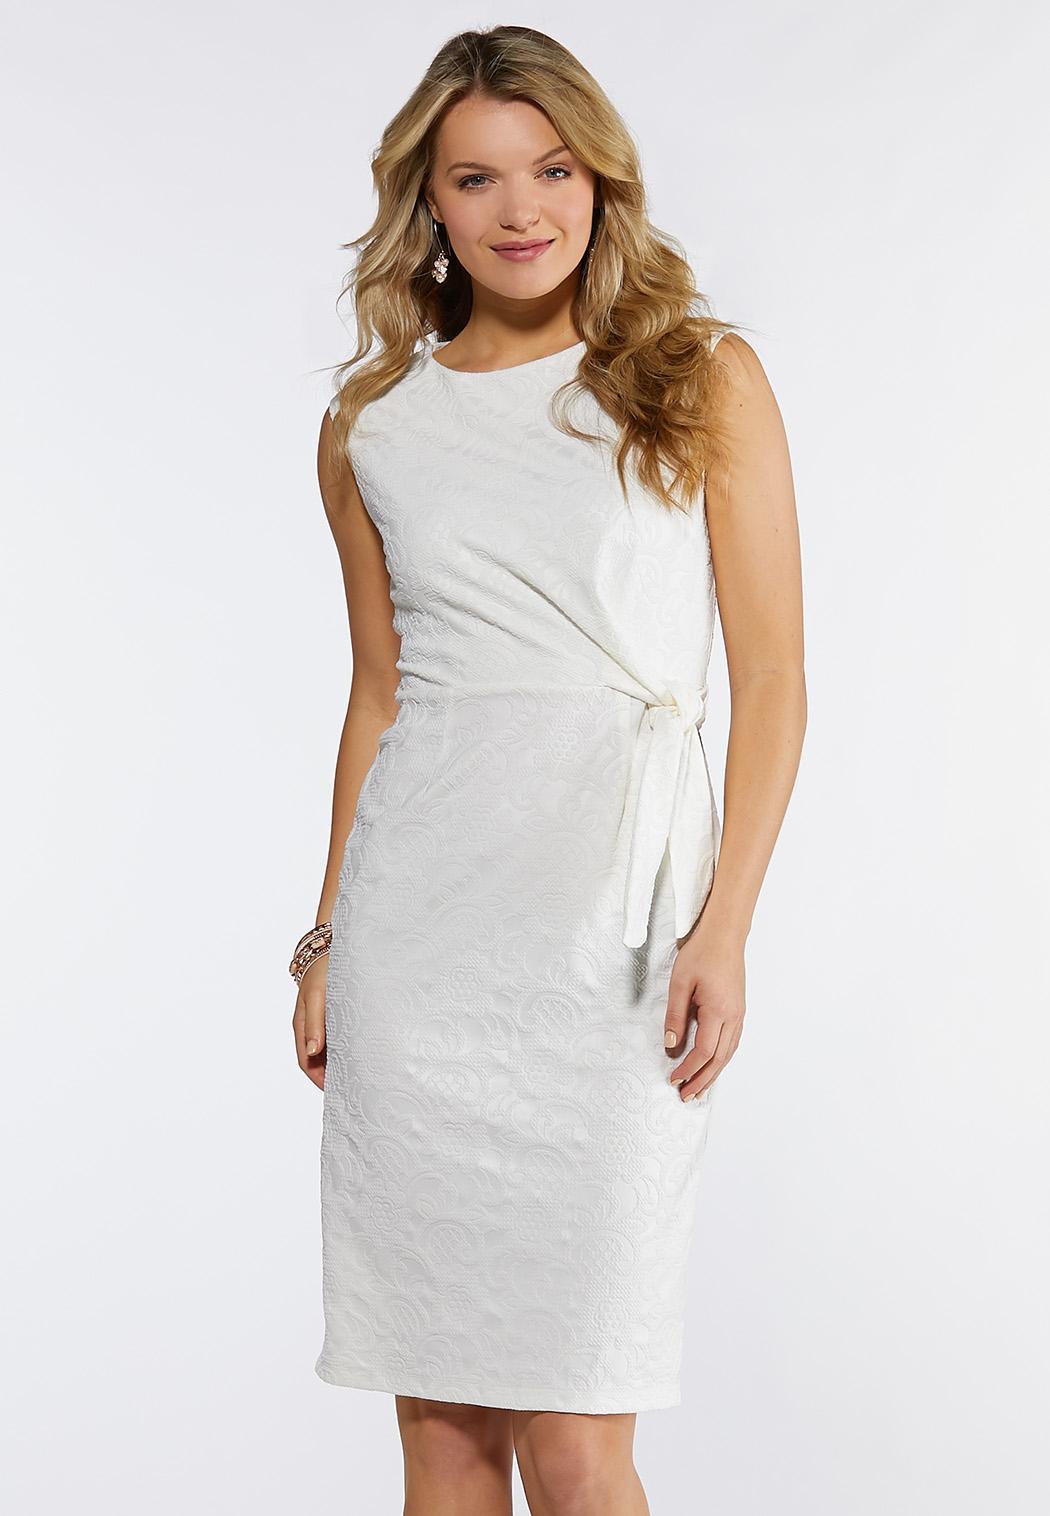 Plus Size Side Tie Knot Sheath Dress Midi Cato Fashions